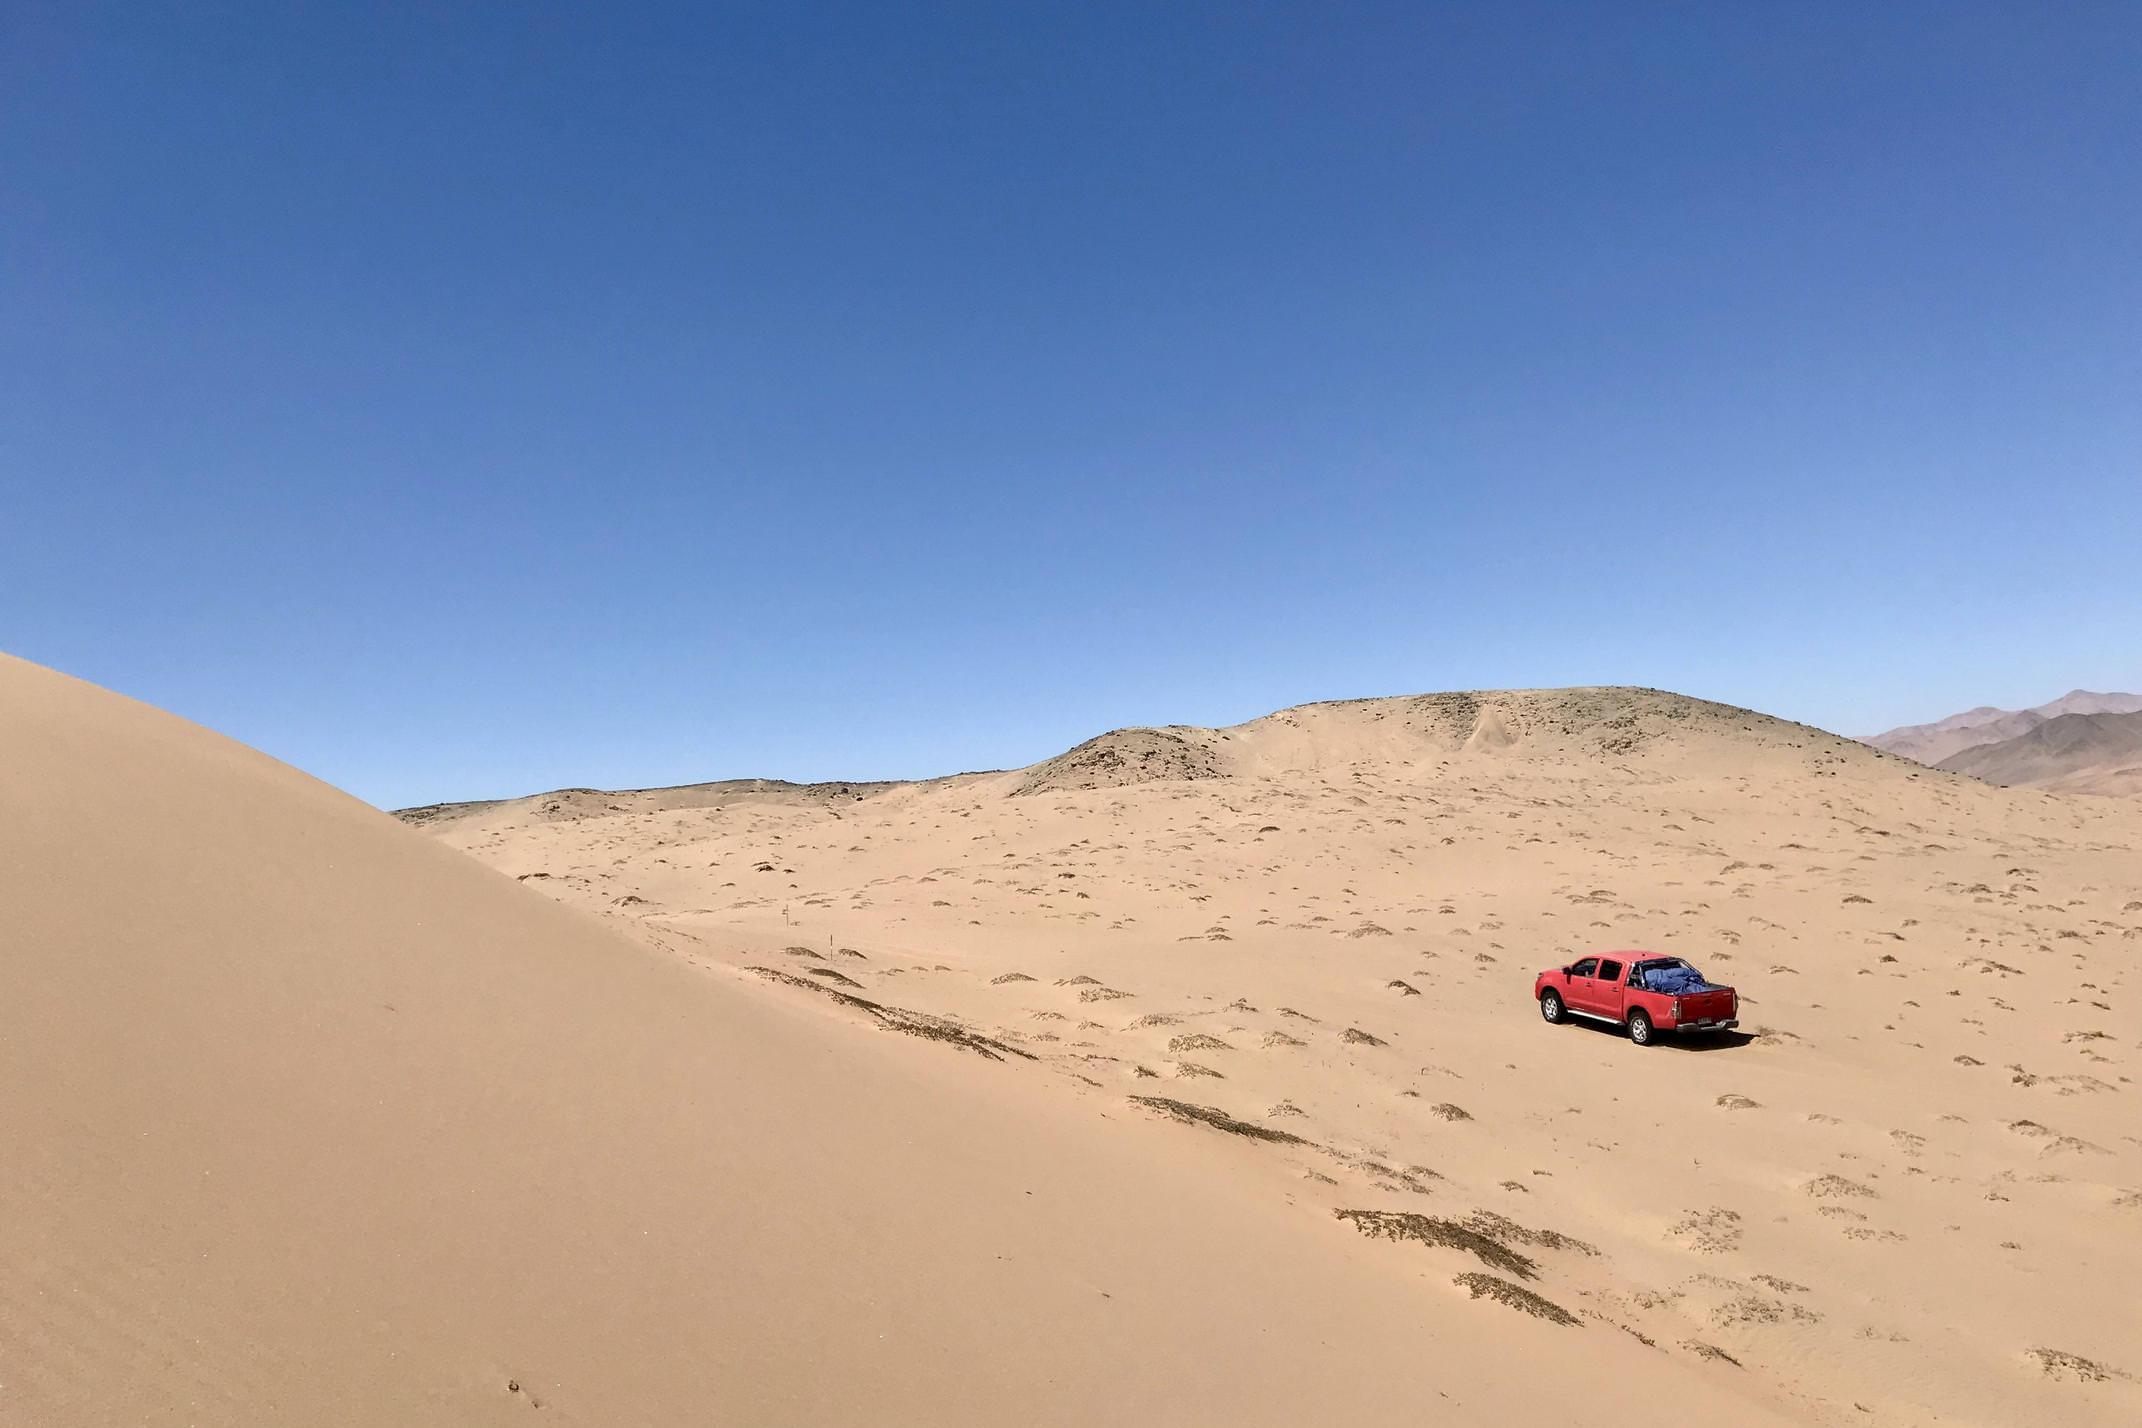 Chile atacama copiapo mar de dunas exploring by pickup c tom power